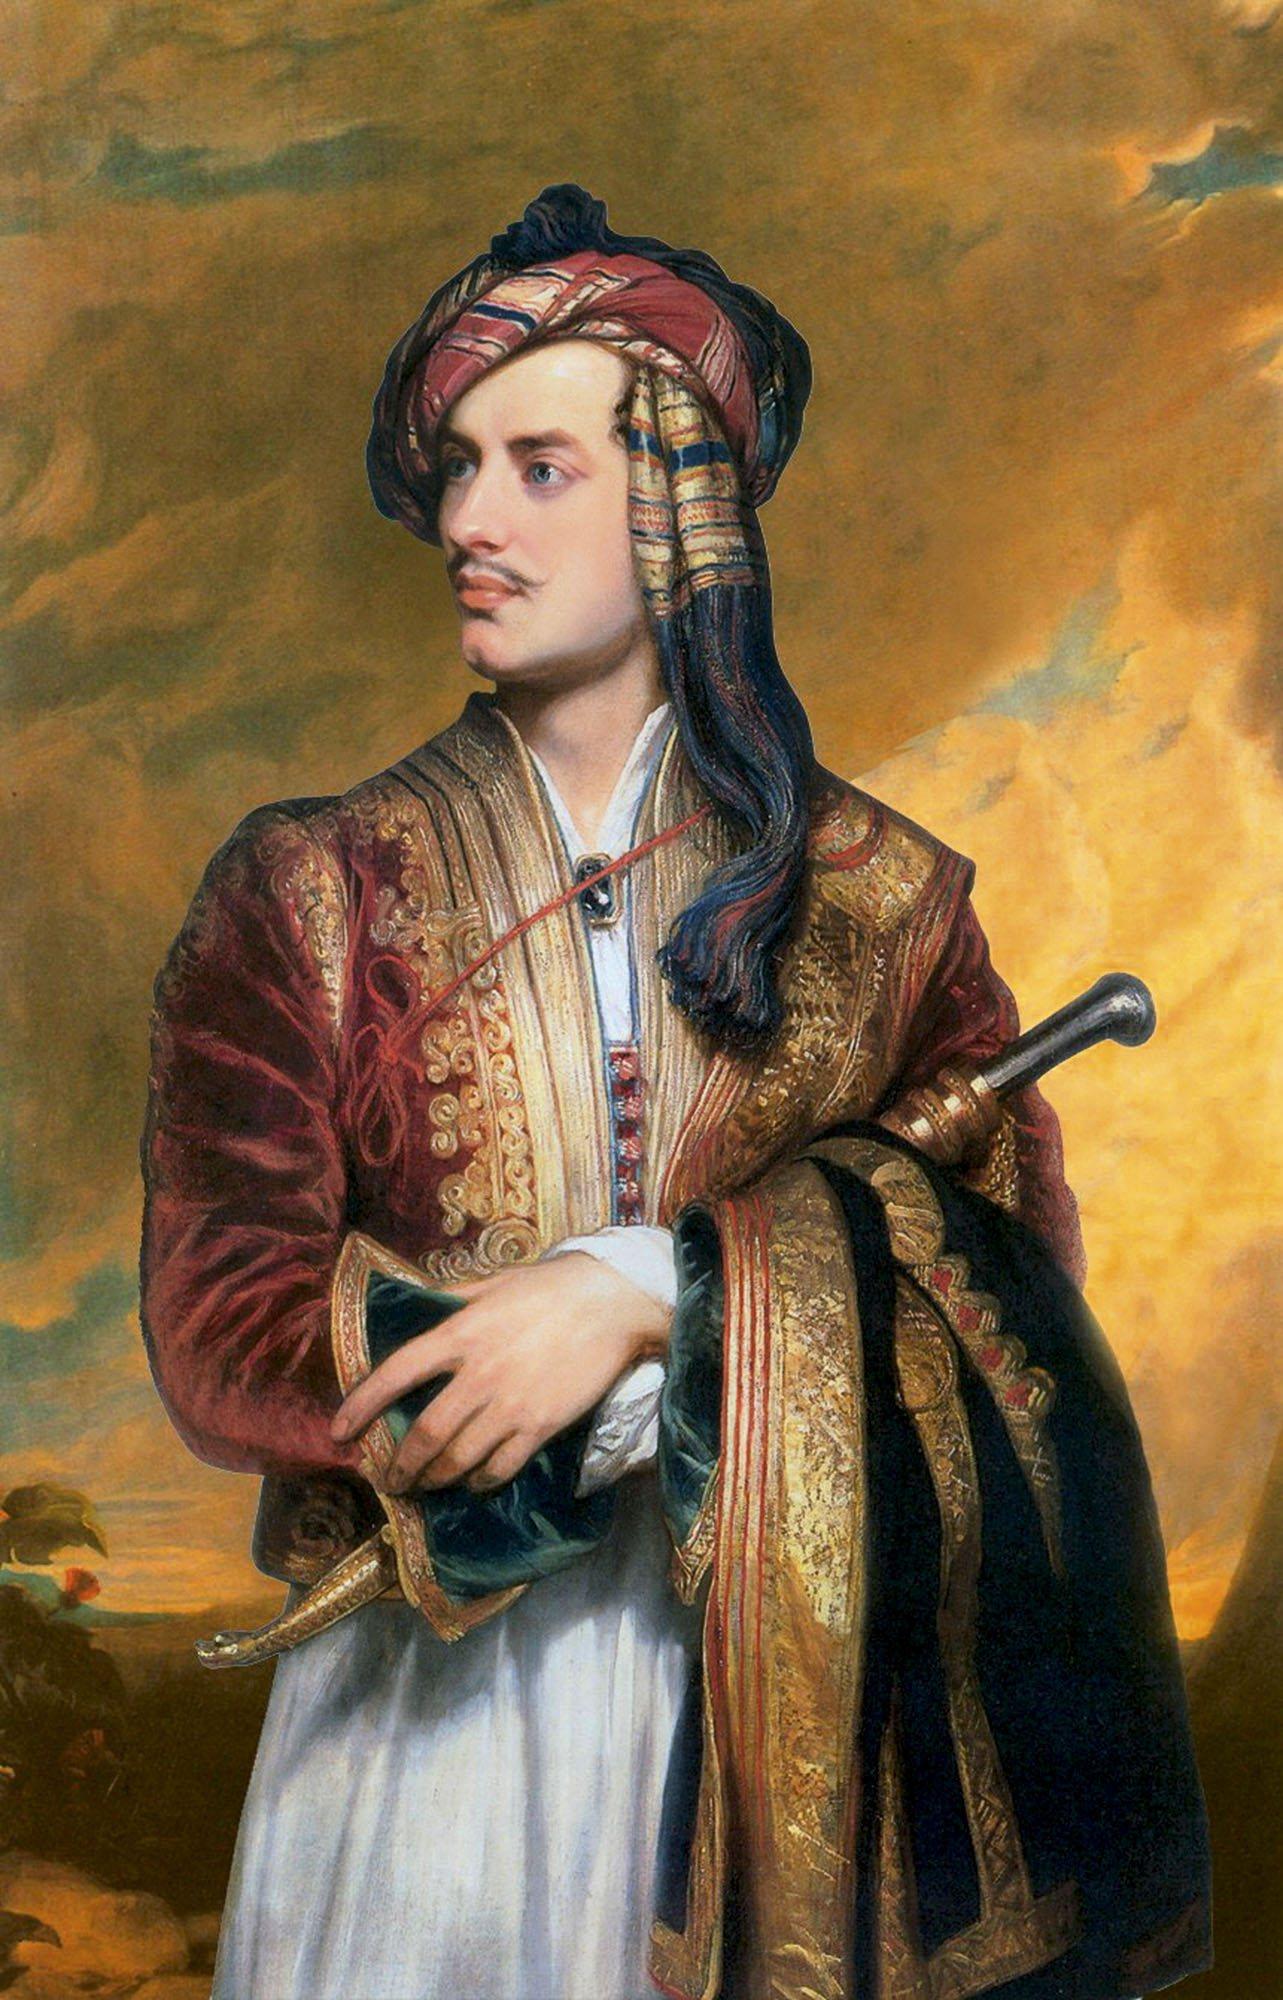 9791281a7 fototeca9x12-712654. Lord Byron